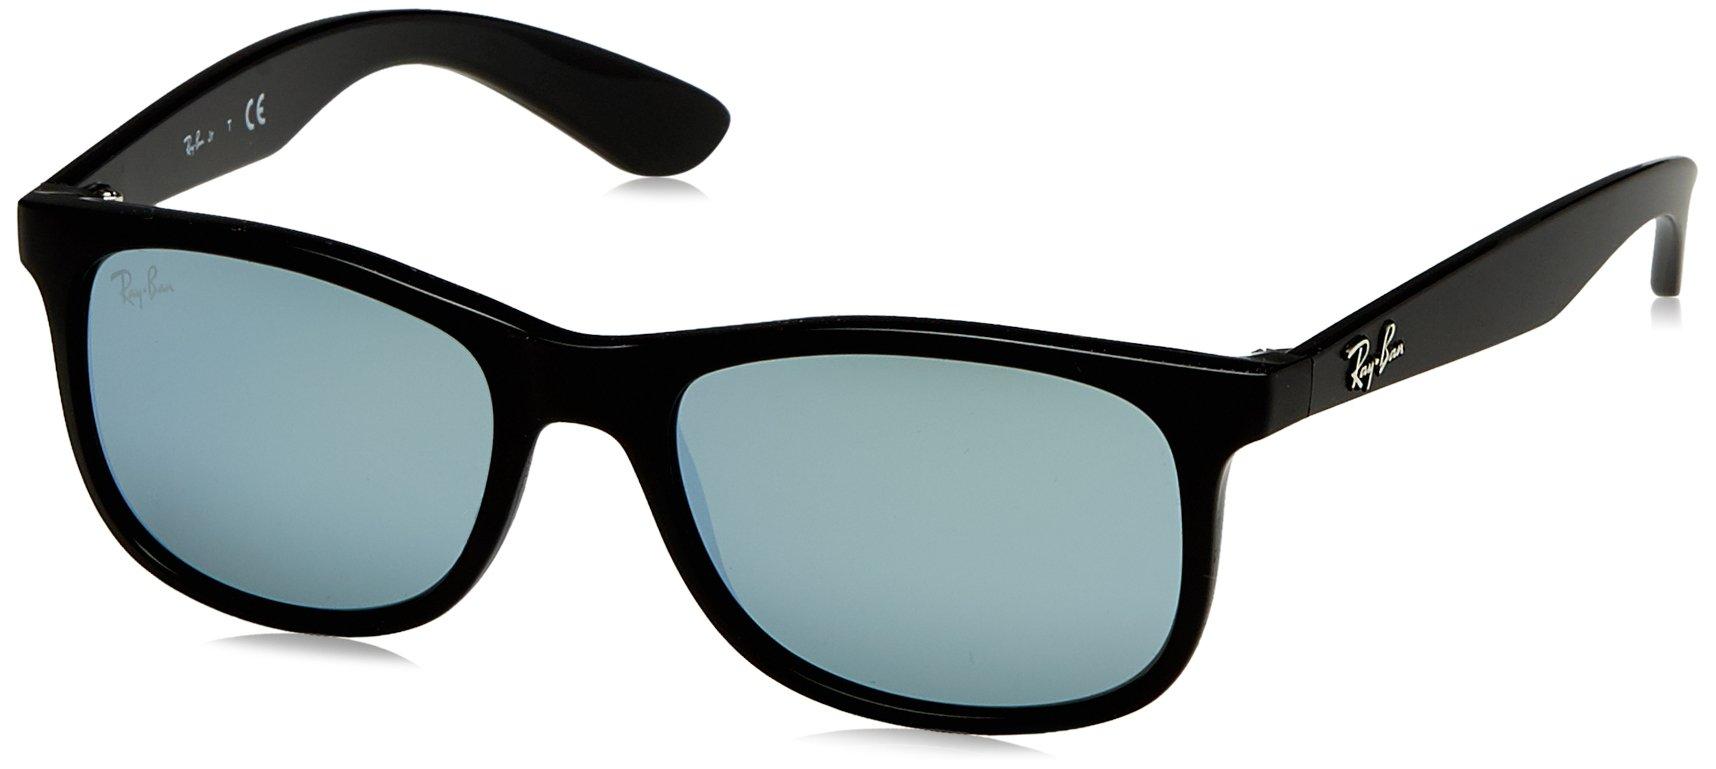 RAY-BAN JUNIOR Kids' RJ9062S Rectangular Kids Sunglasses, Matte Black On Black/Silver Mirror, 48 mm by RAY-BAN JUNIOR